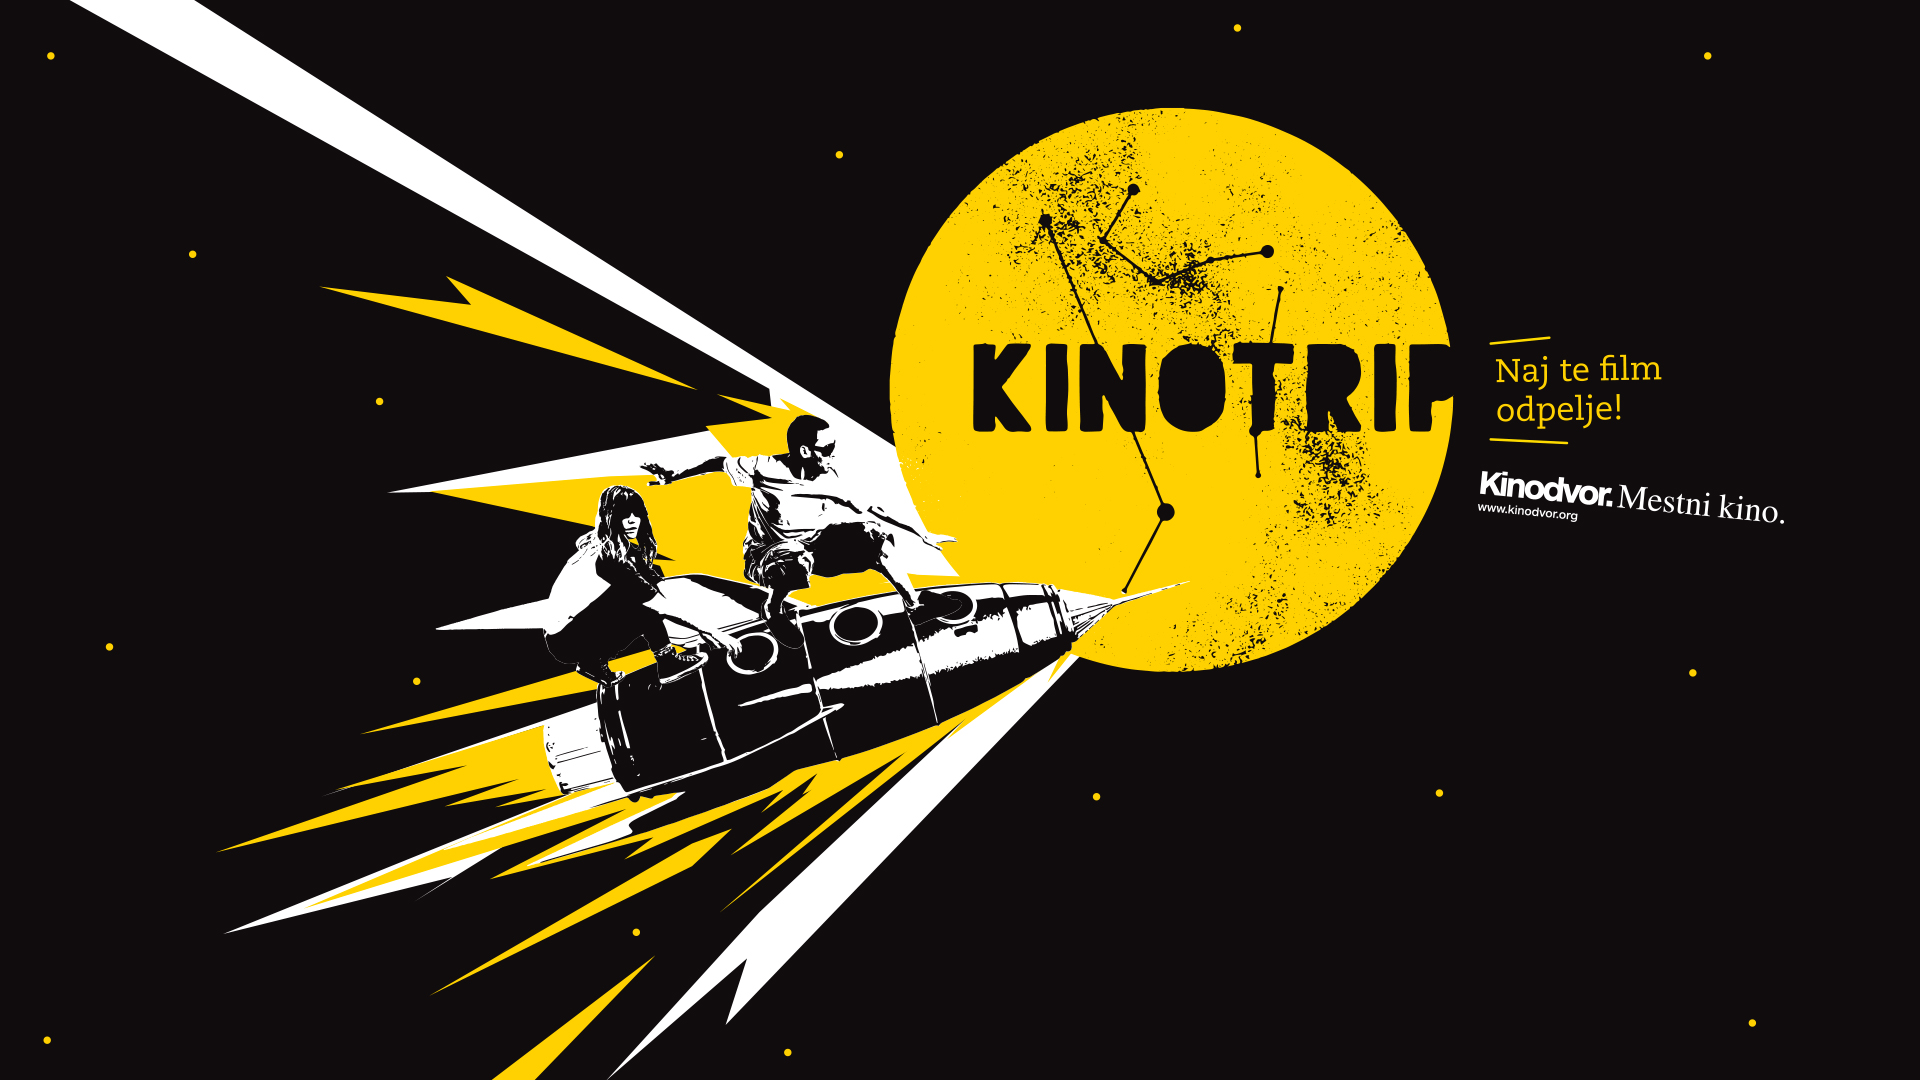 Datumi 5. filmskega festivala Kinotrip